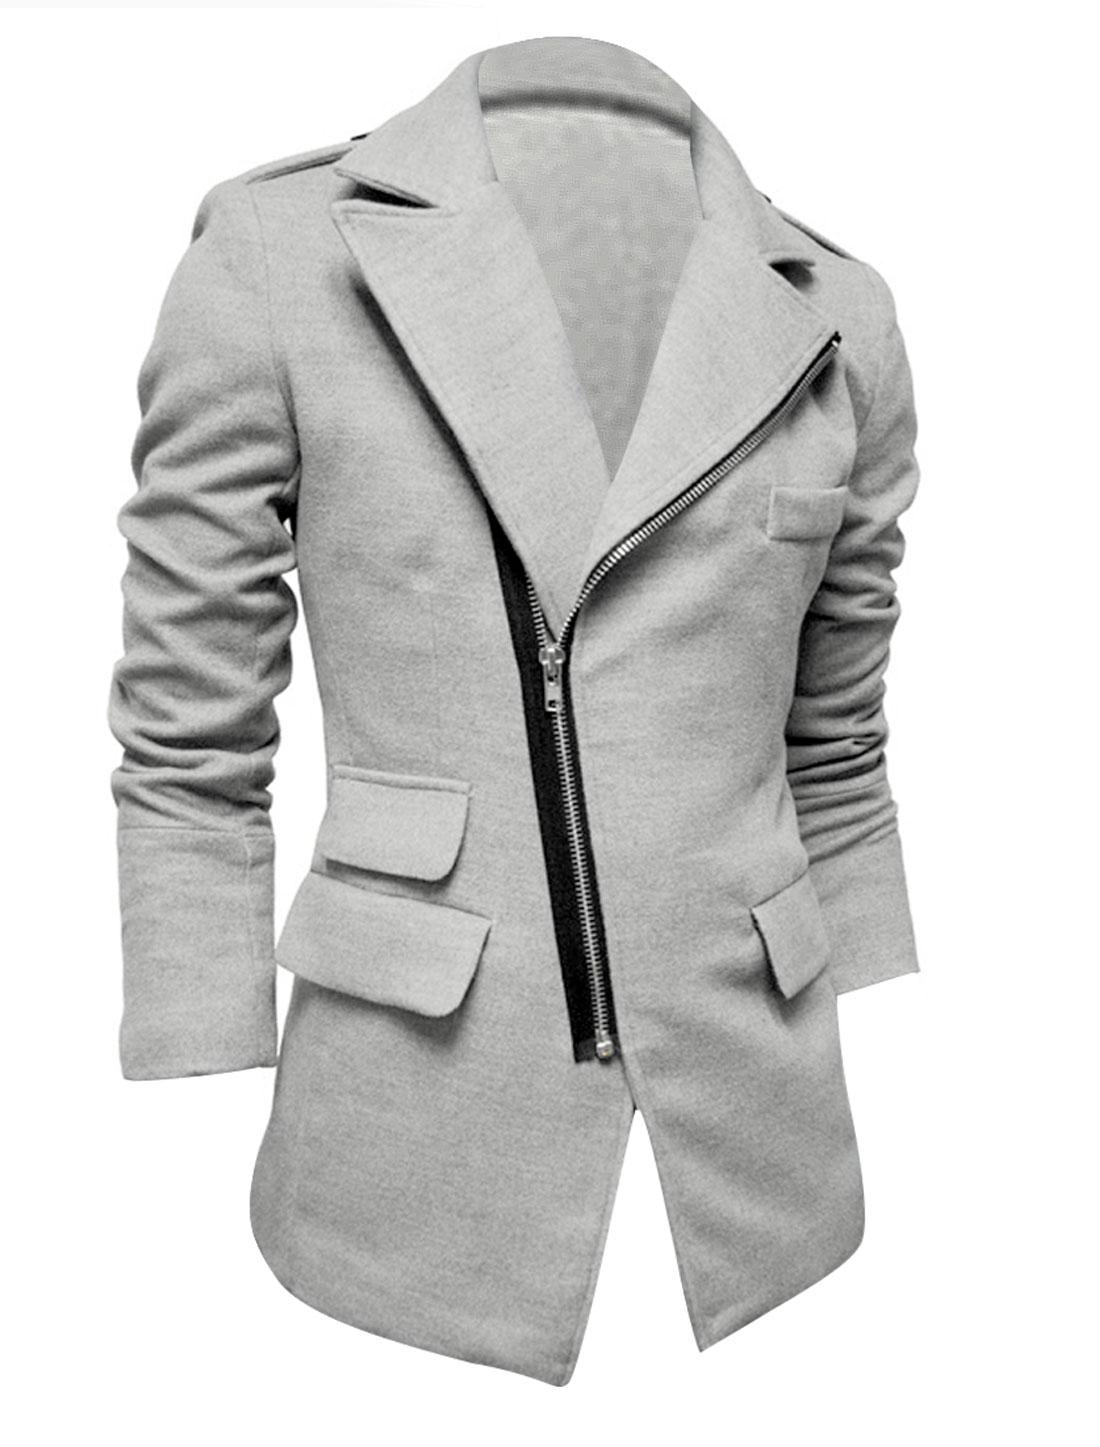 Light Grey M Slim Fit Long Sleeve Notched Lapel Jacket Coat for Men